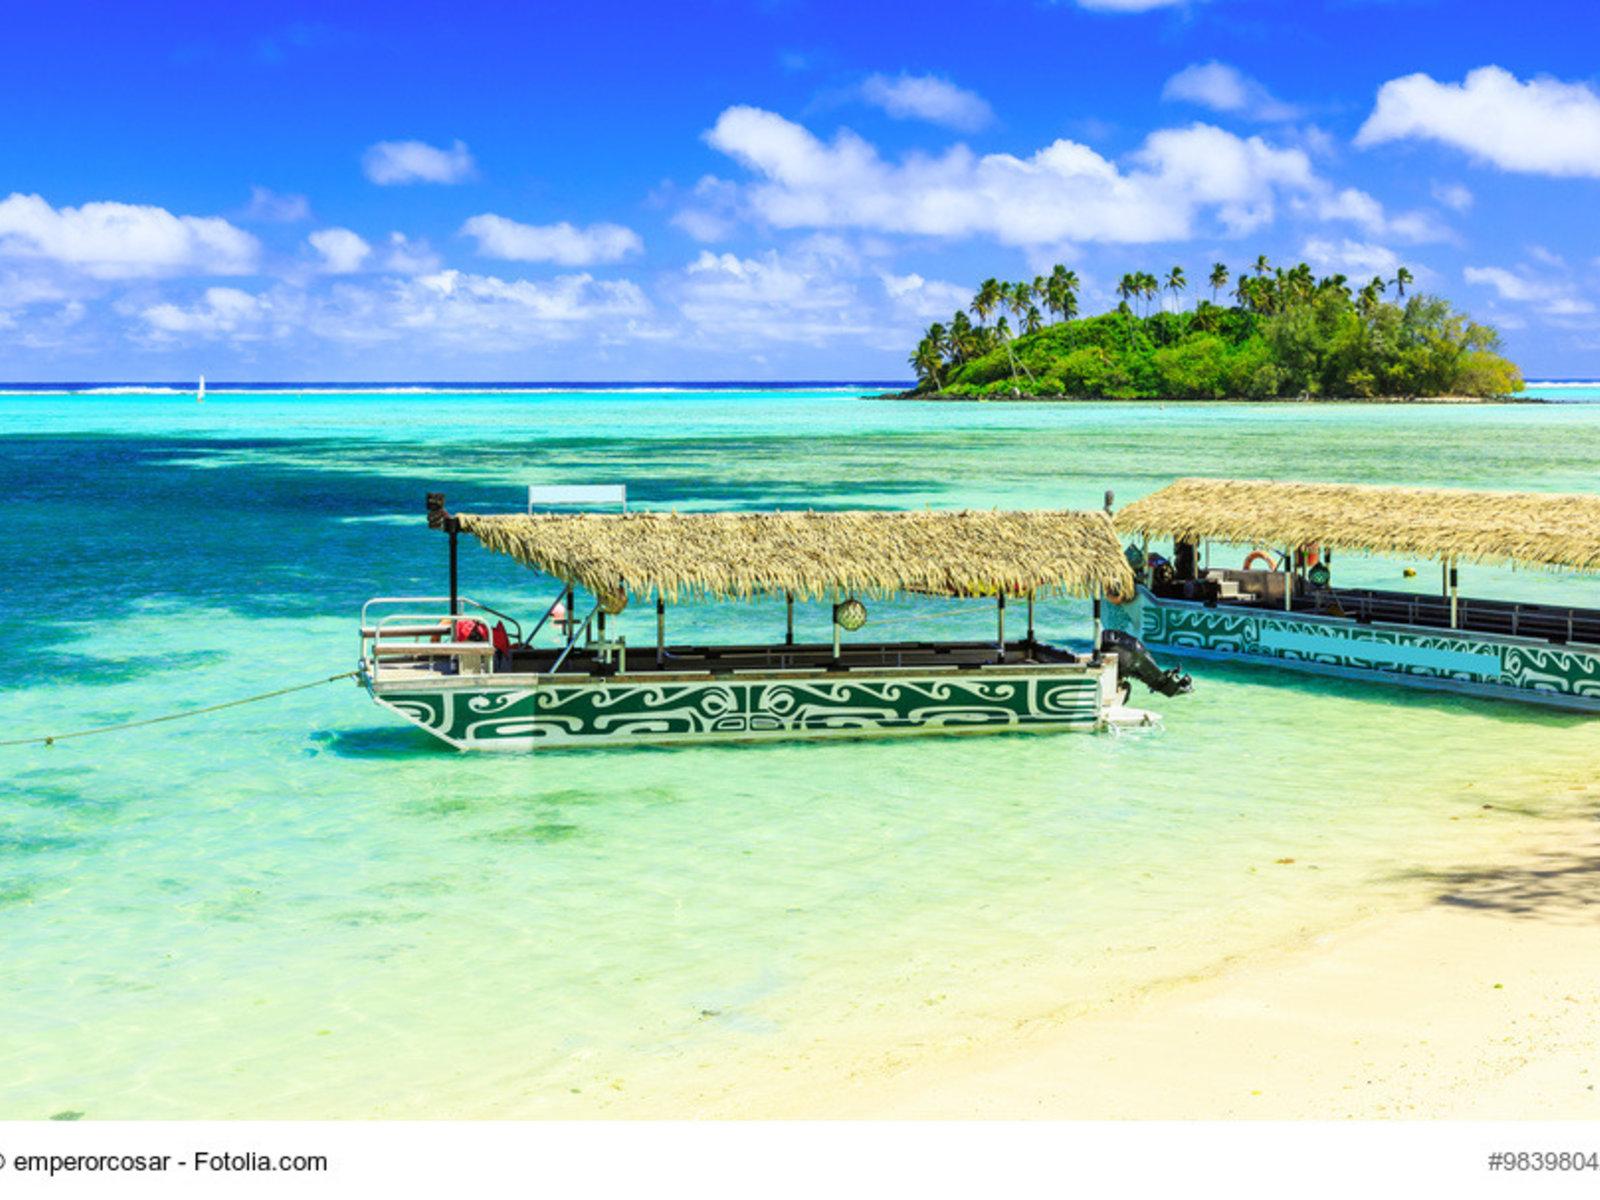 Rarotonga © emperorcosar - Fotolia.com